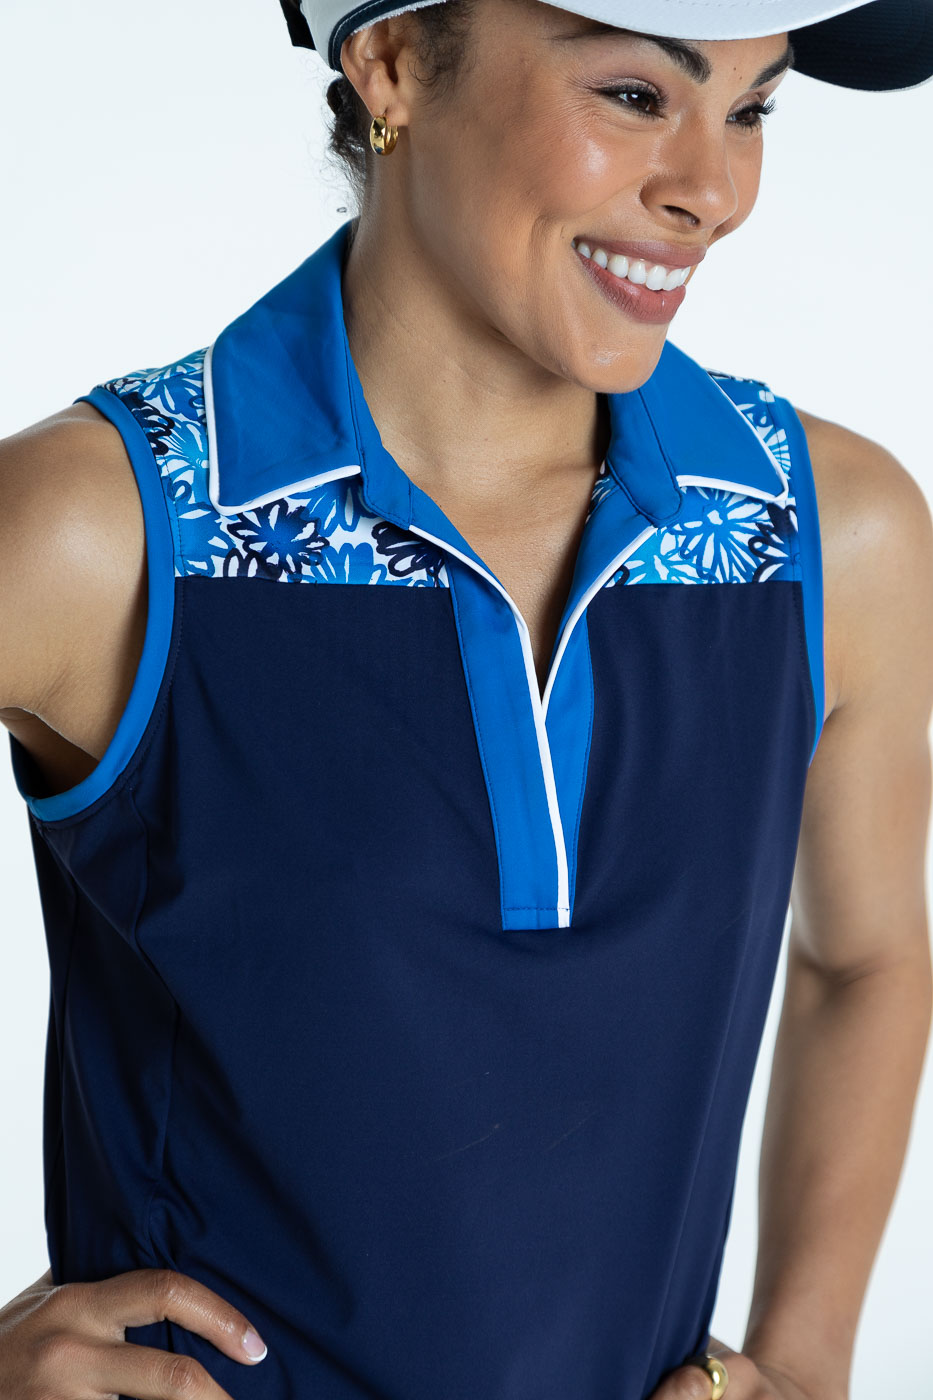 Close-up front view of woman wearing a navy blue Chip Shot sleeveless golf dress